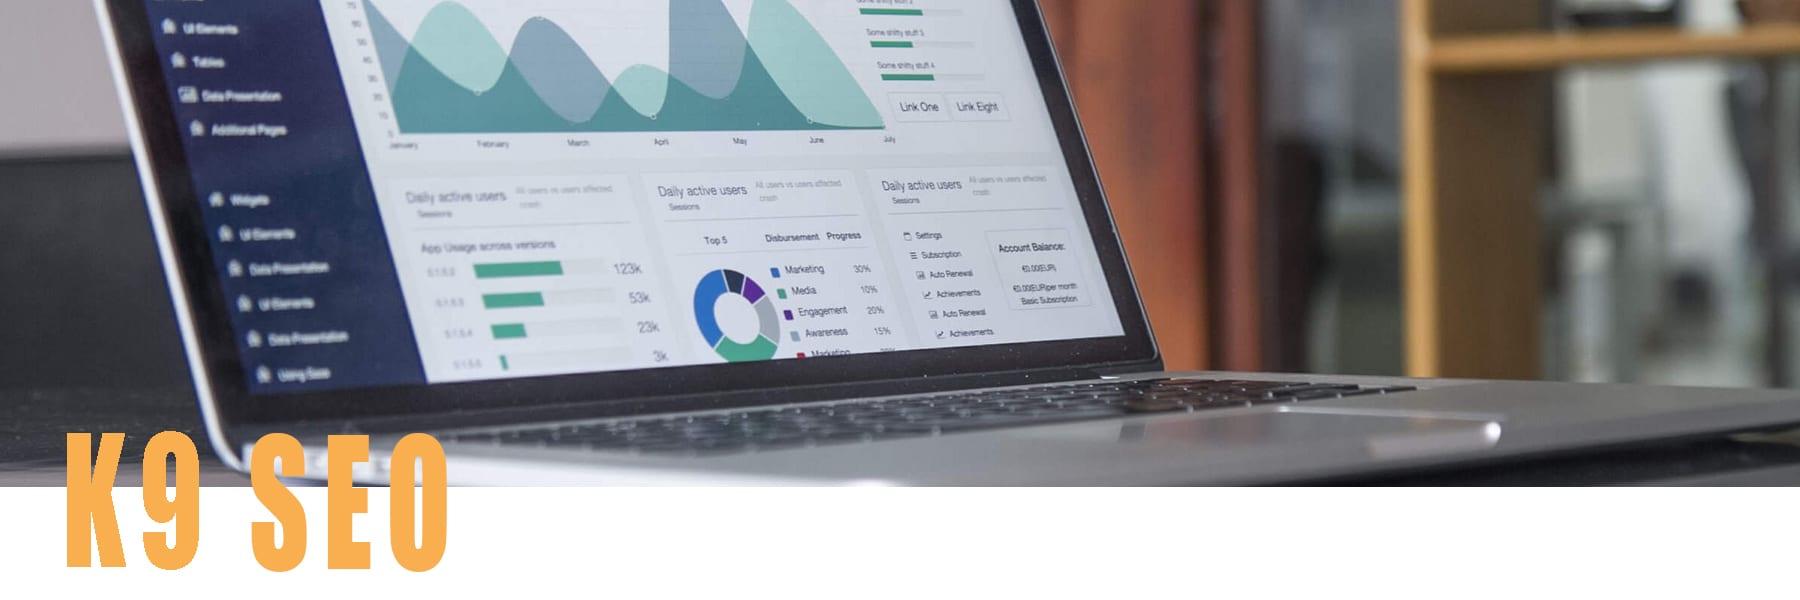 Team member computer showing SEO analytics data